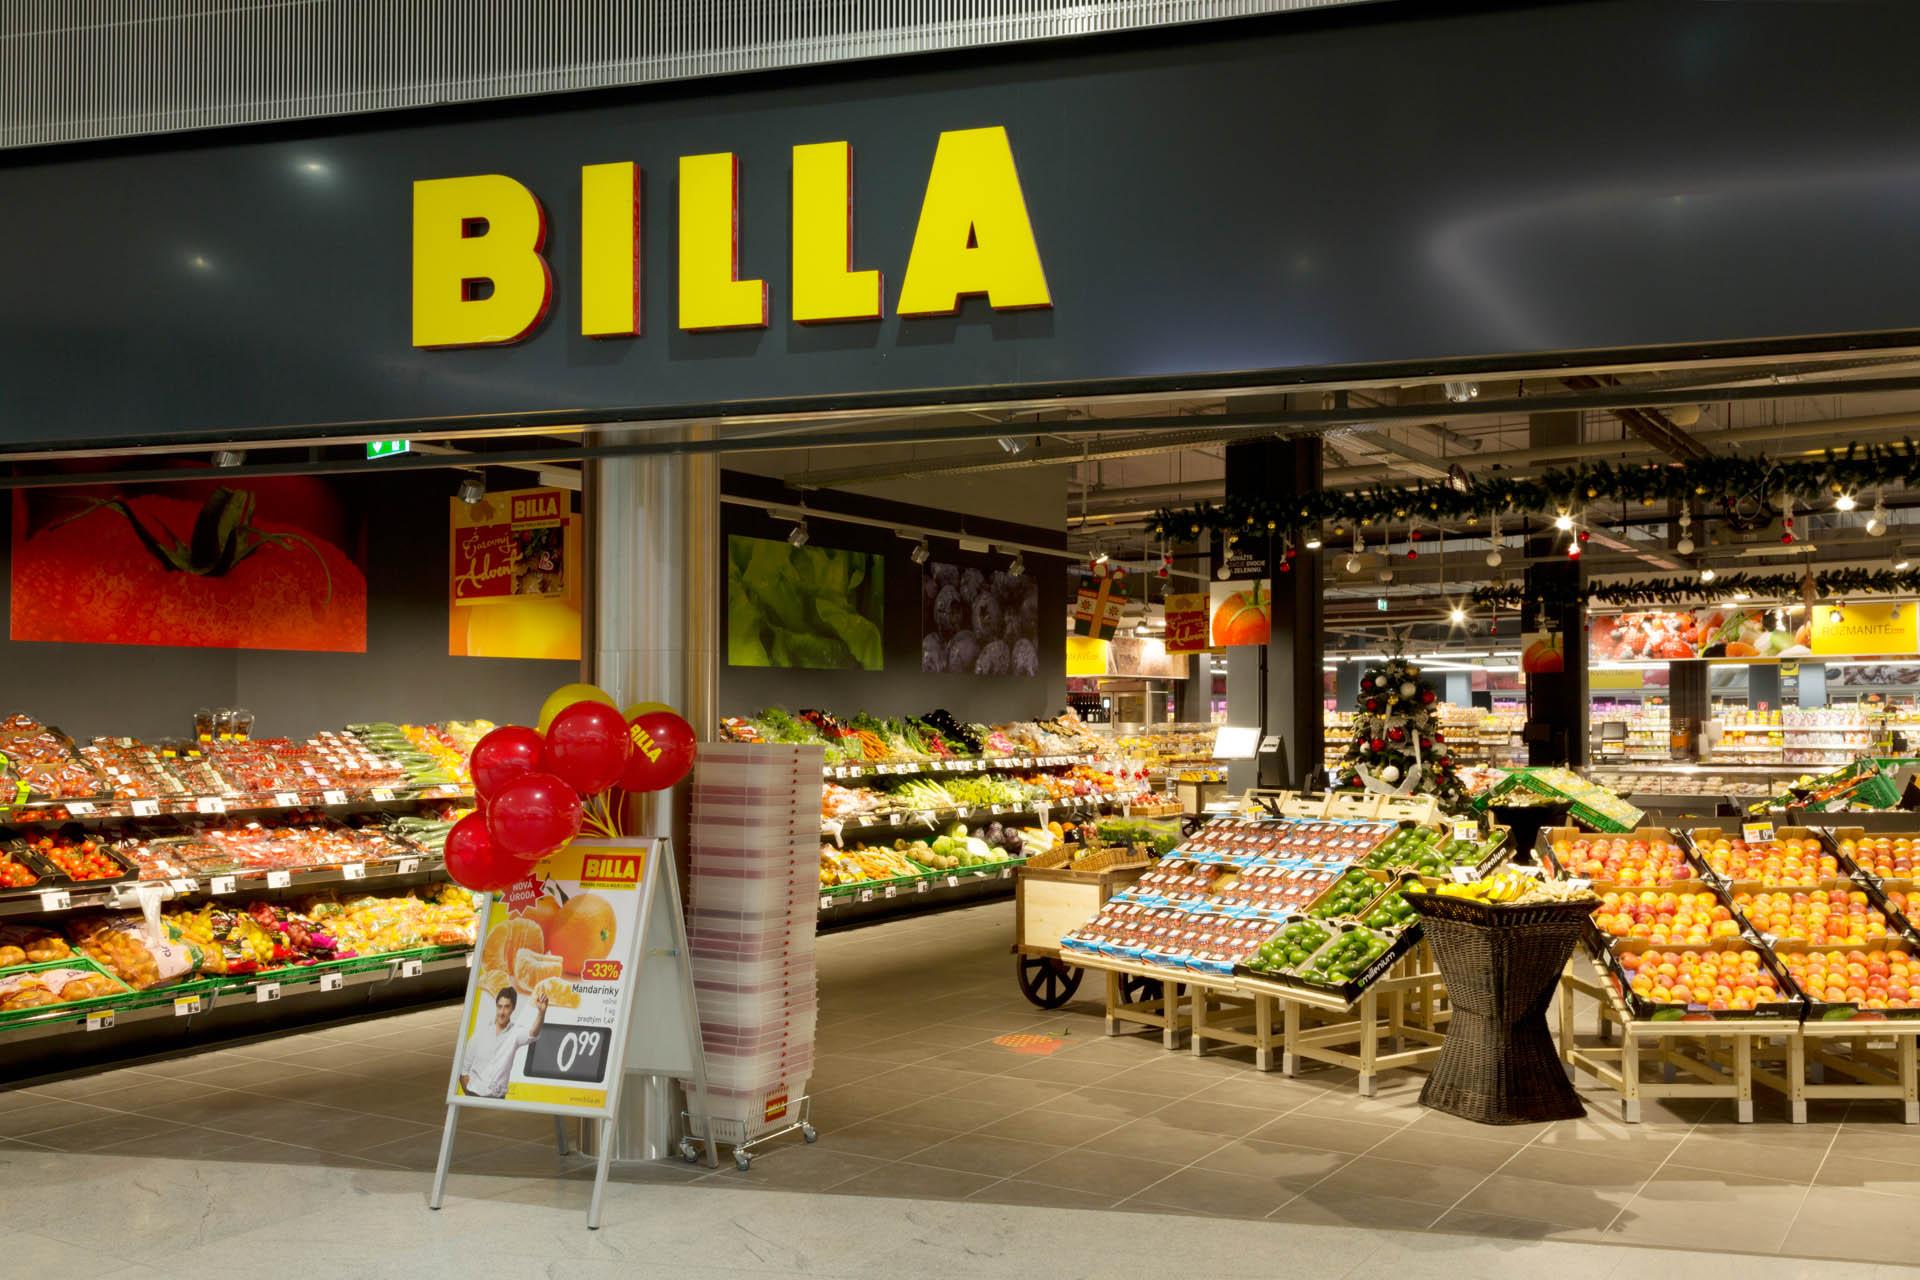 Billa References Smart Lighting Engineering